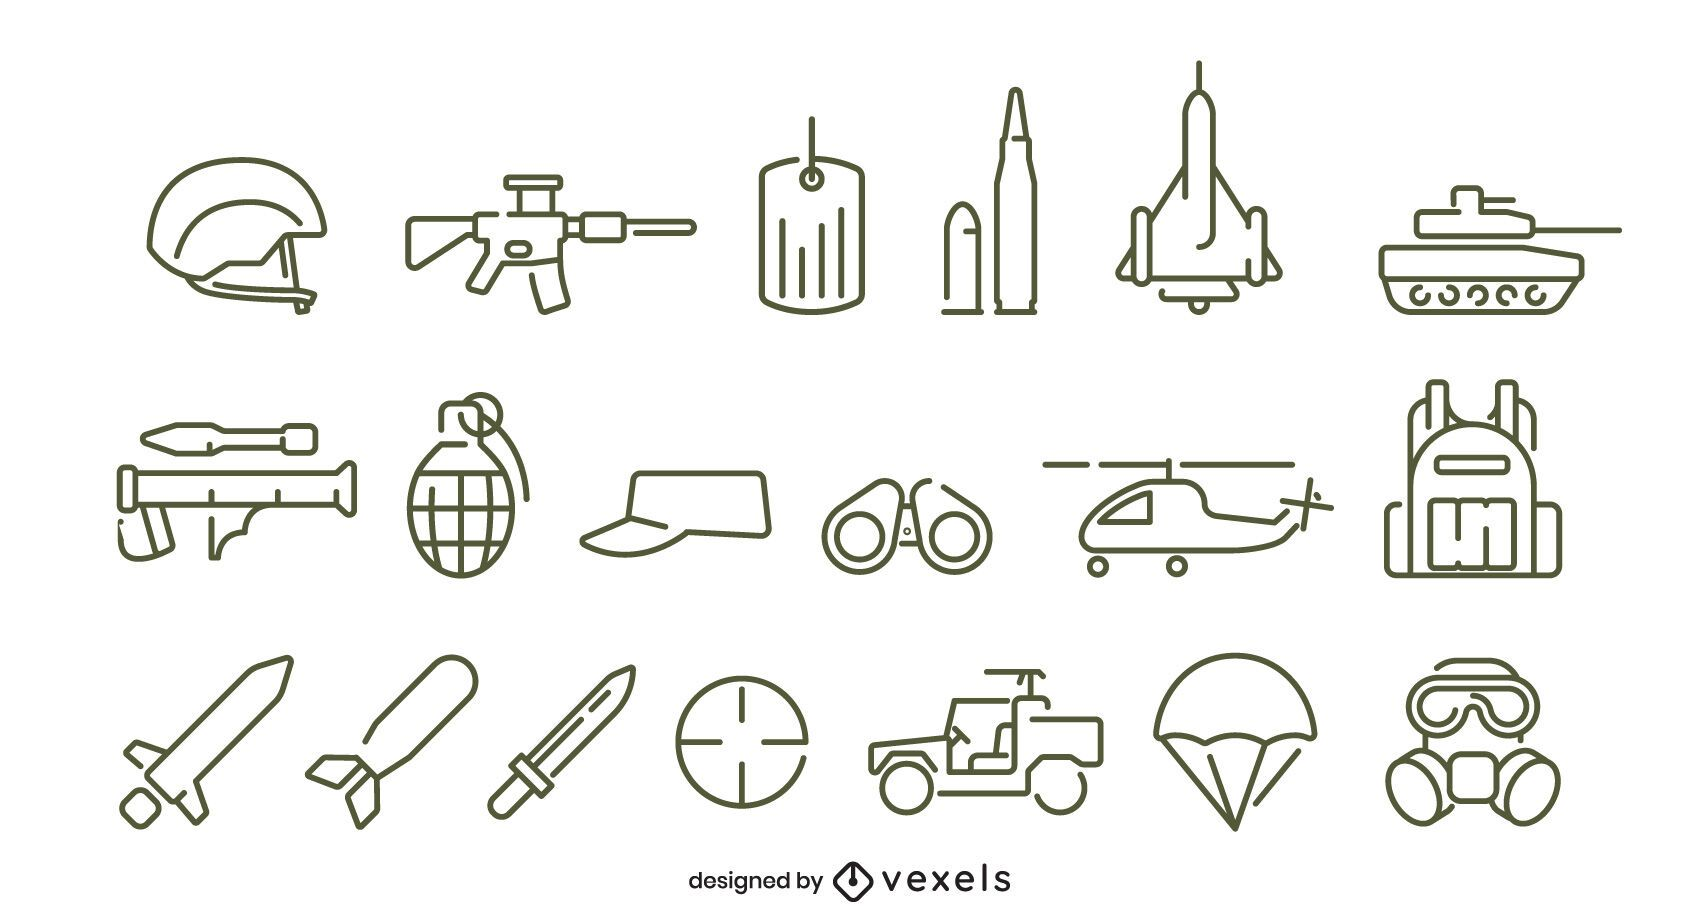 Army stroke icon set design